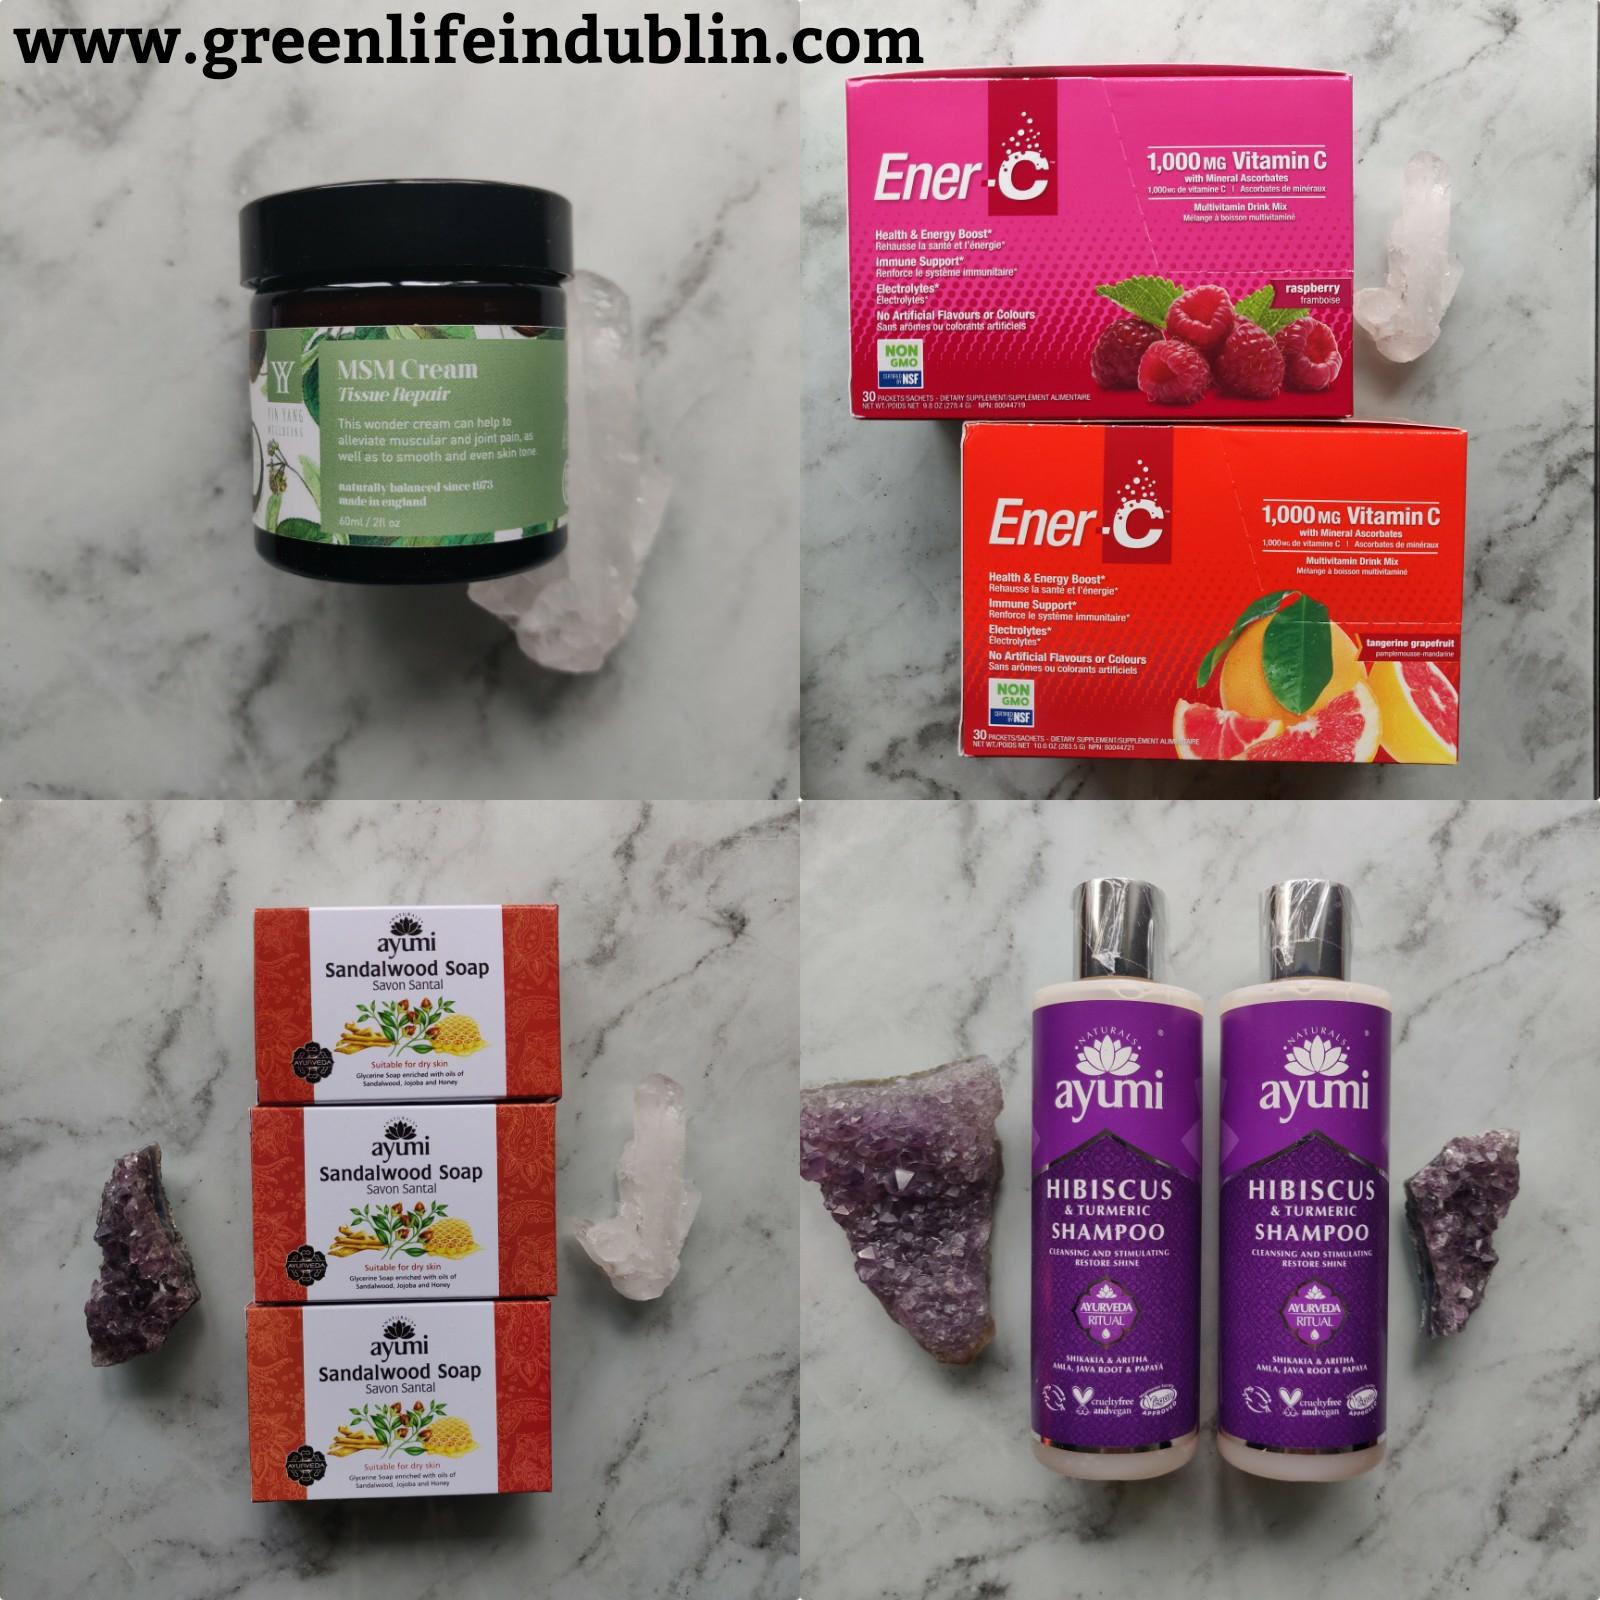 Love Lula Picks & Reviews - Green Life In Dublin